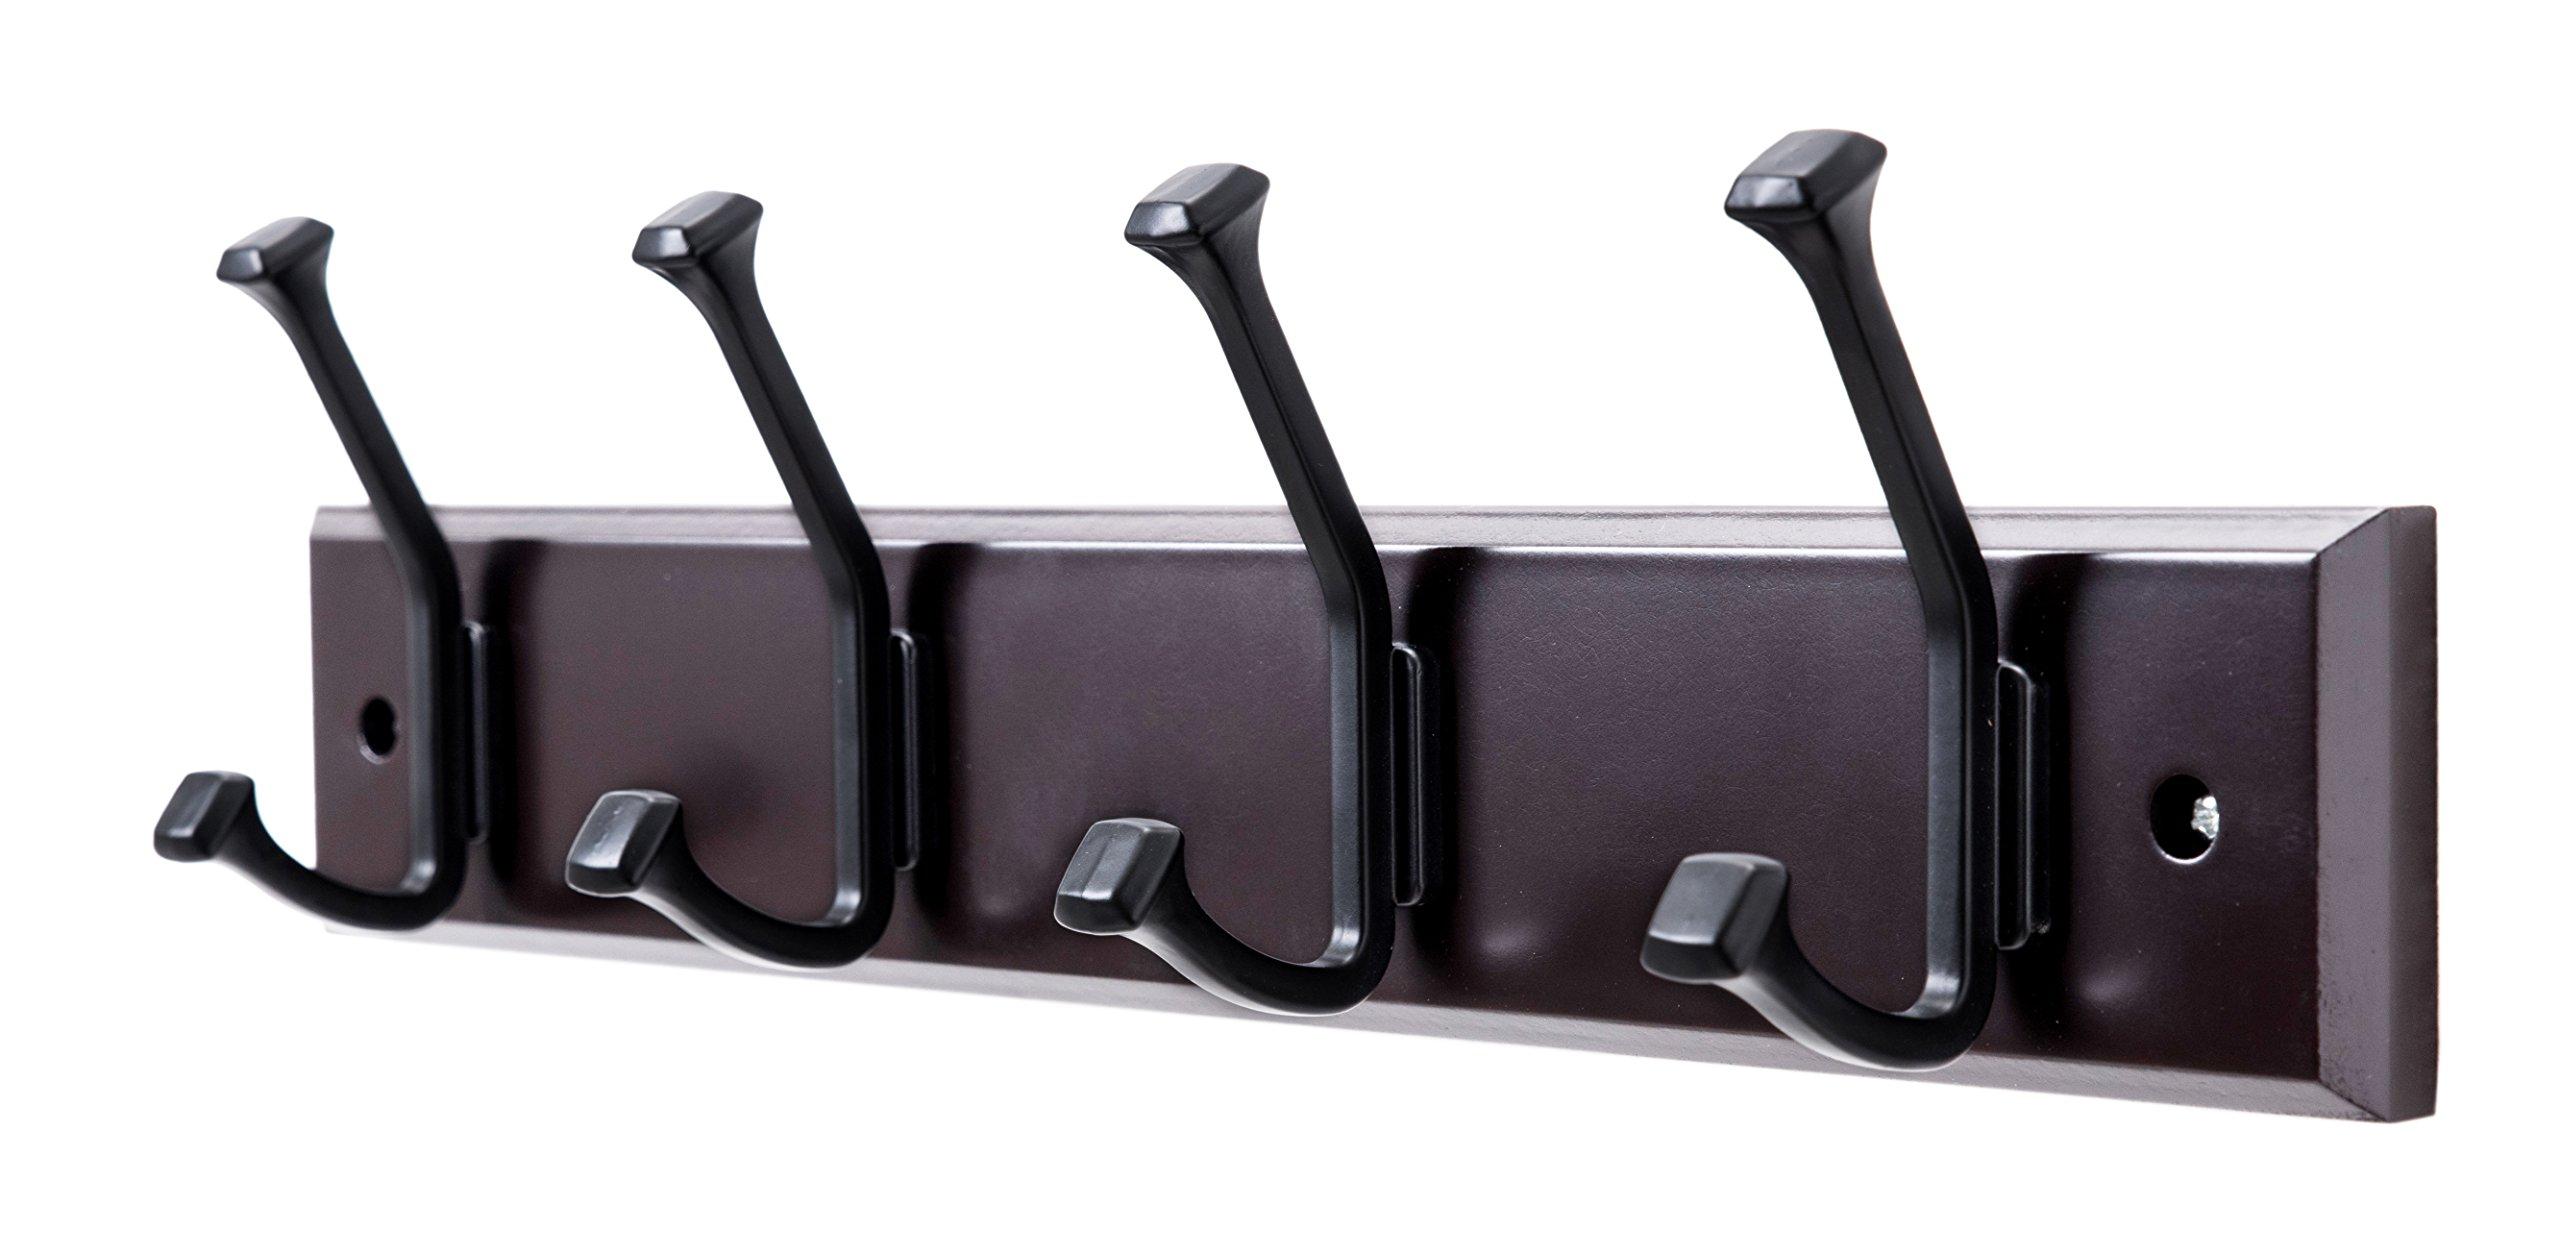 Finnhomy Wooden Coat Hooks Wall Hooks 4 Dual Hooks 16-Inch Rail/Pilltop Rack Long Coat Rack for Clothes Entryway Foyer Storage Organization Bathroom Towel Key Accessory Espresso/Black Hook